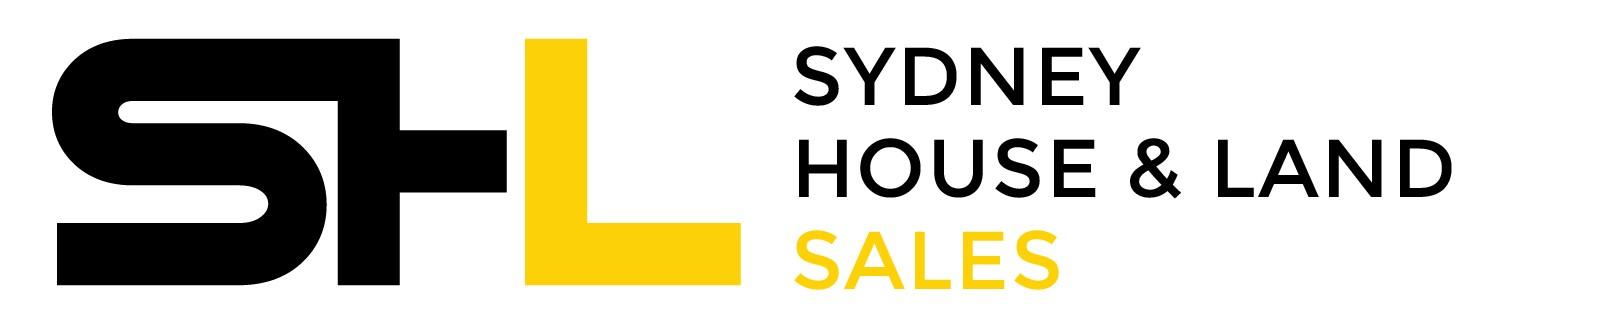 Sydney House Land